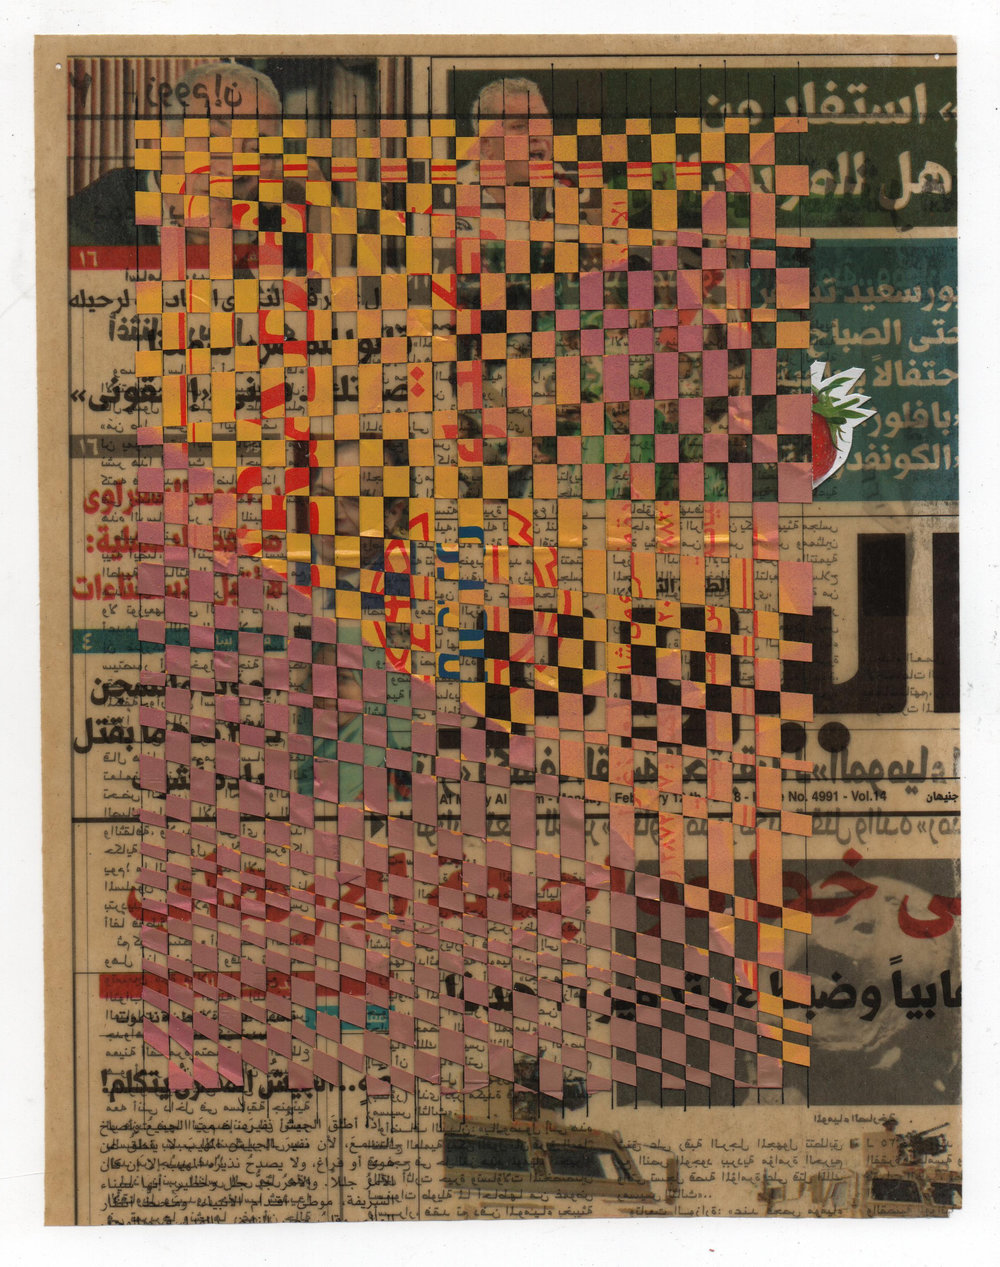 Promotional Materials On AlMasry Alyom, 2018, newspaper, polyurethane, acto trade sticker, spray paint, 24 x 18.5 cm.